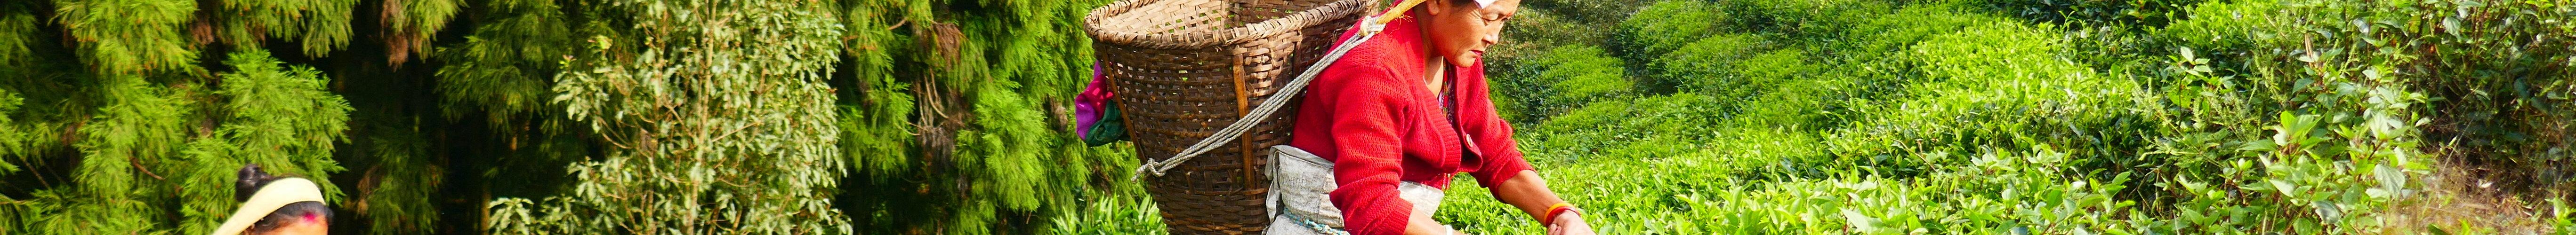 Teplantage i Nepal